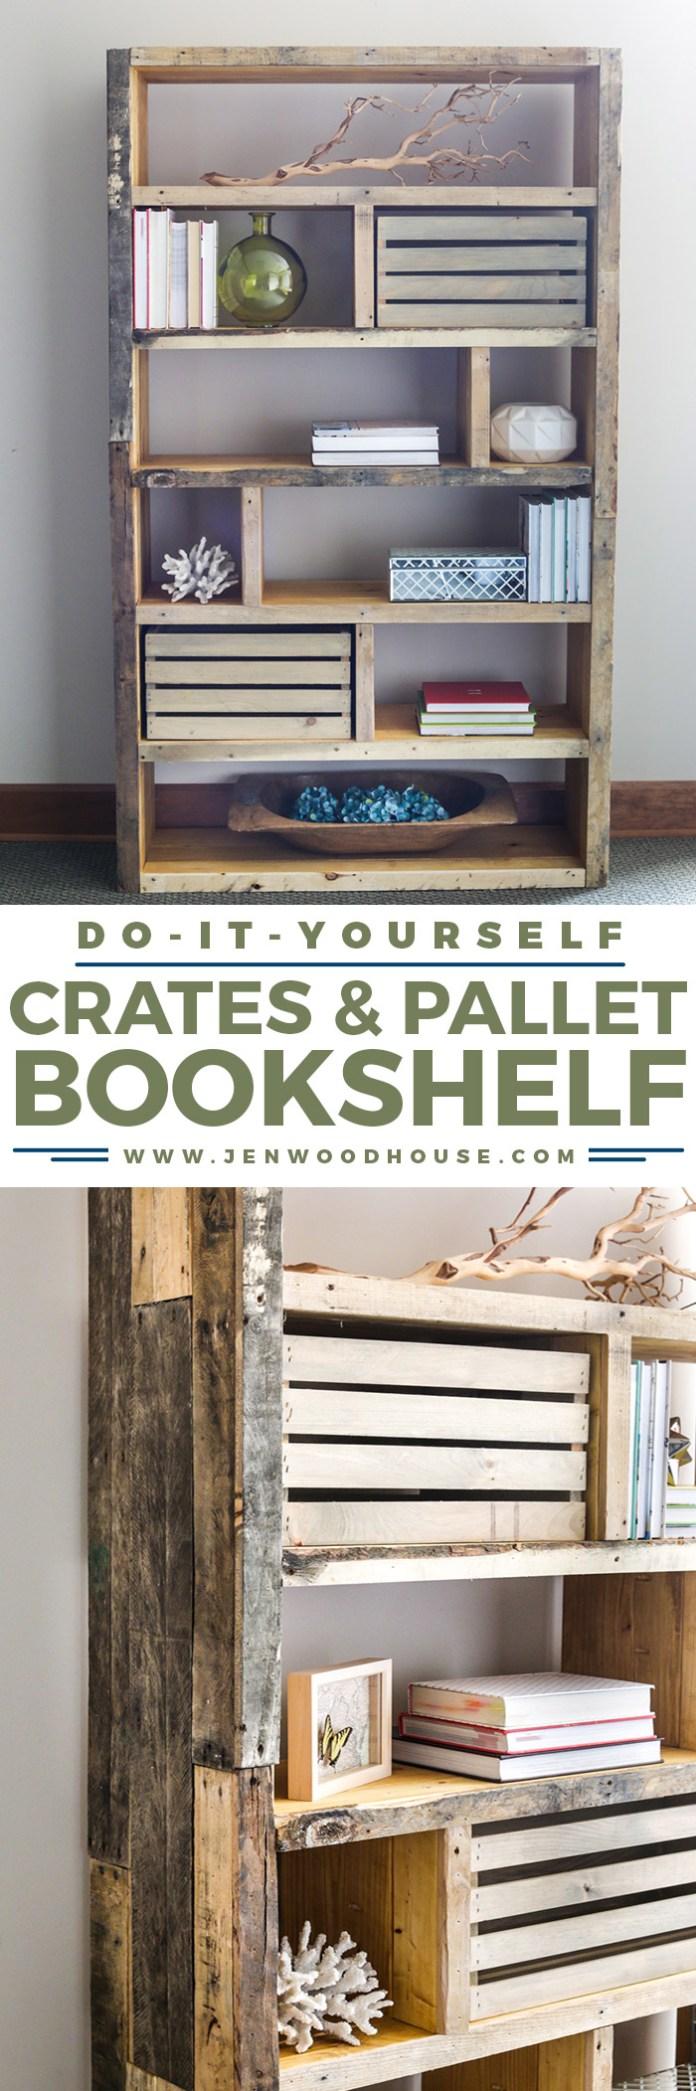 9. Bookshelf from Reclaimed Wood via Simphome